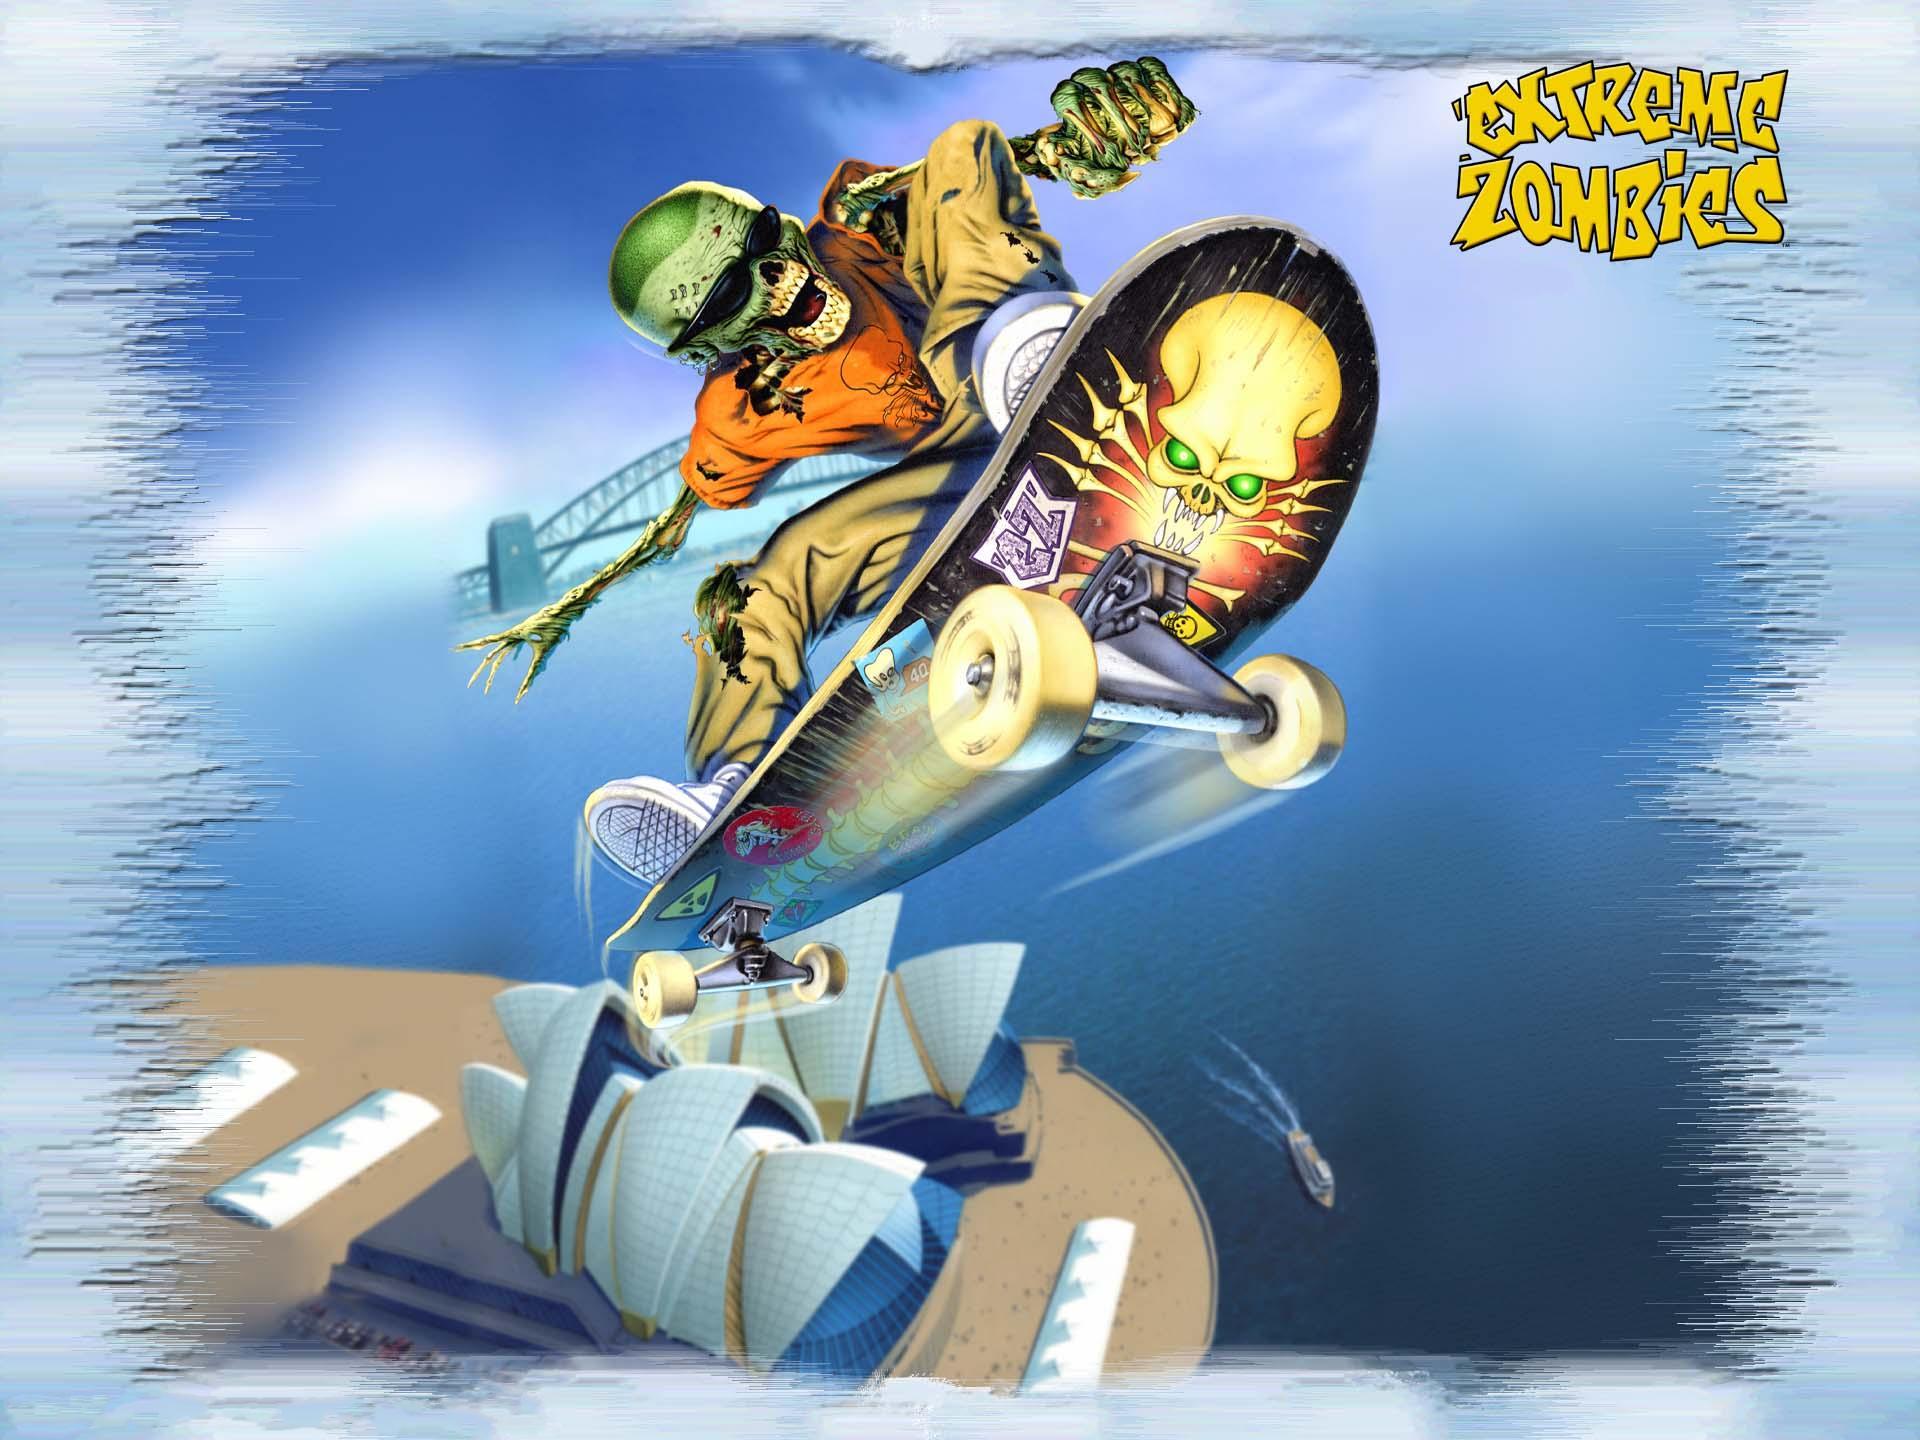 Fonds d'ecran Skateboard Fantasy télécharger photo